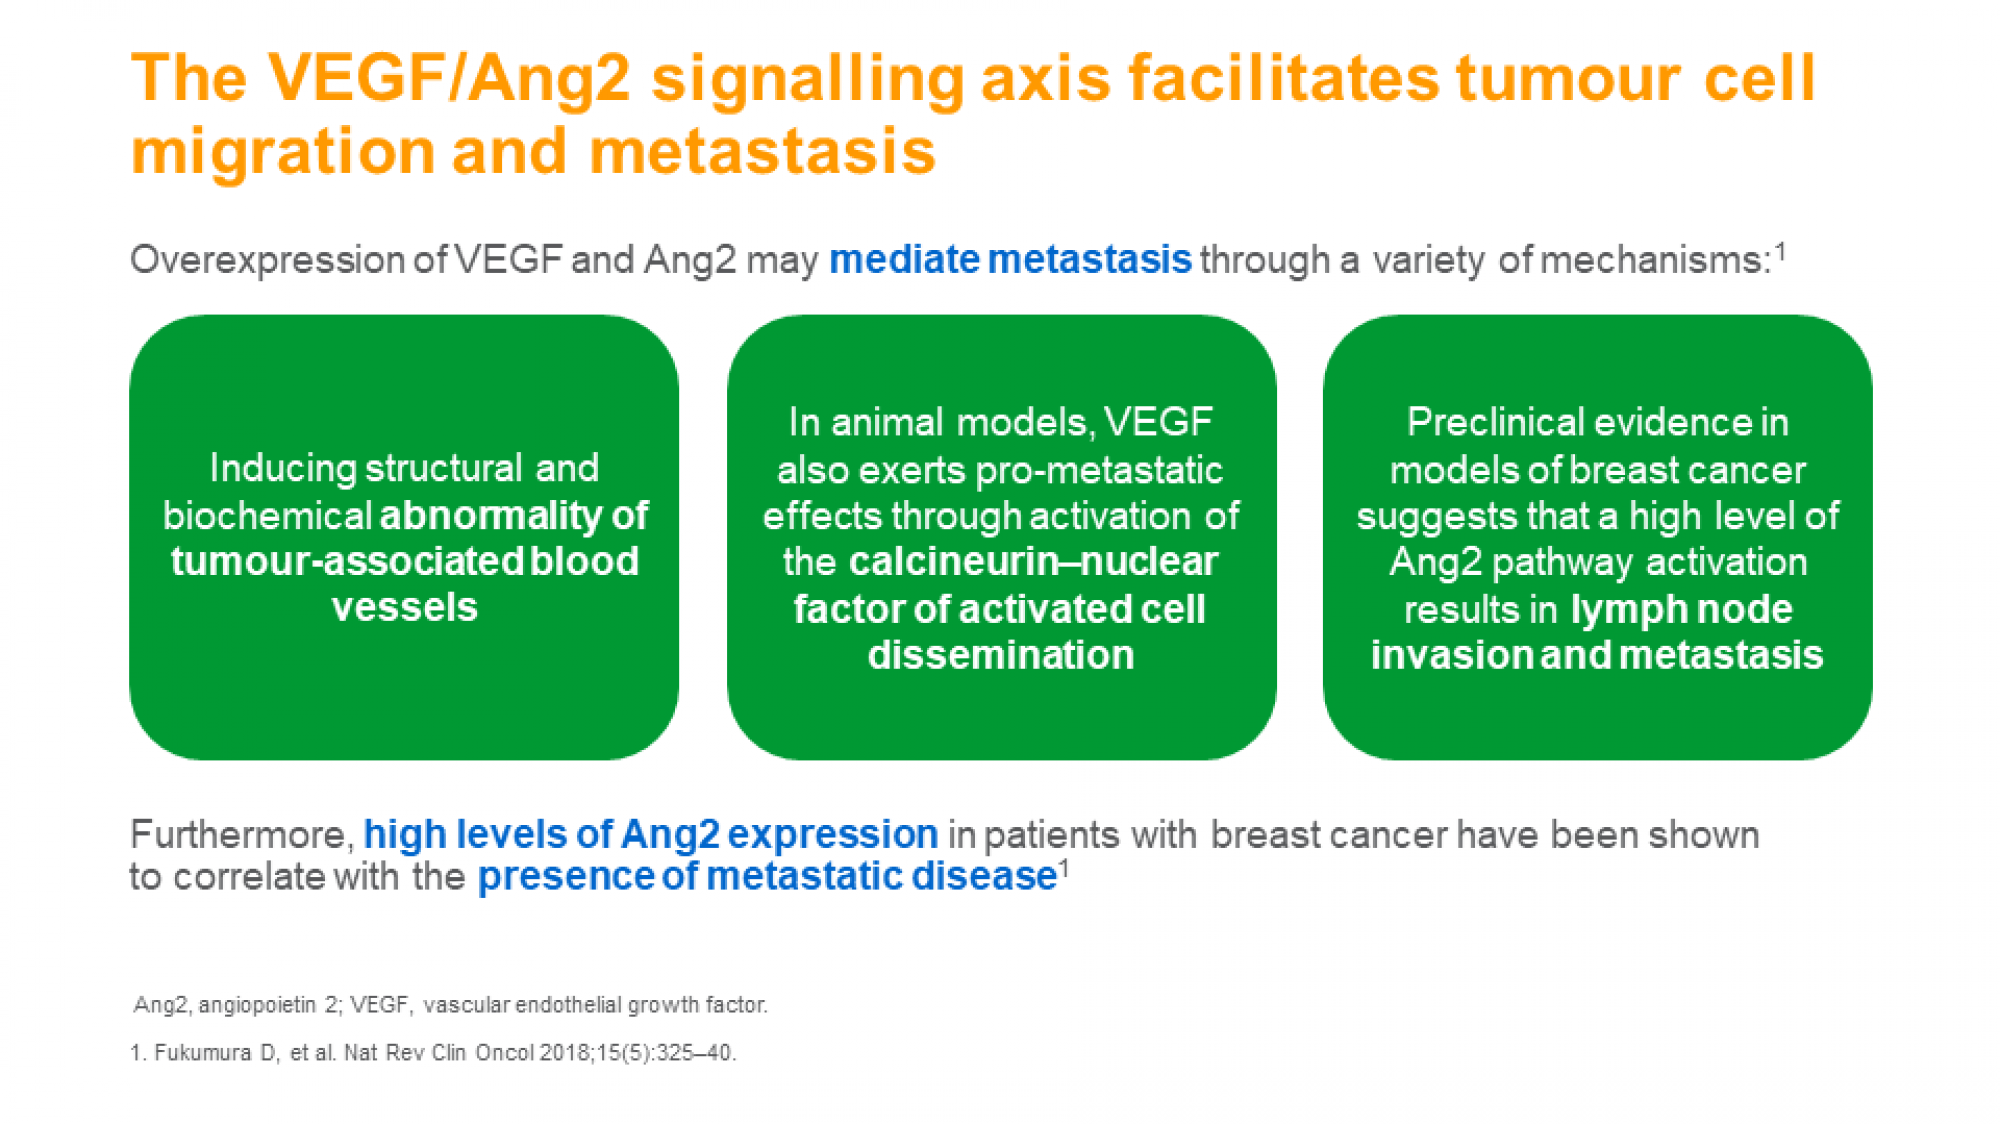 Disrupting angiogenesis